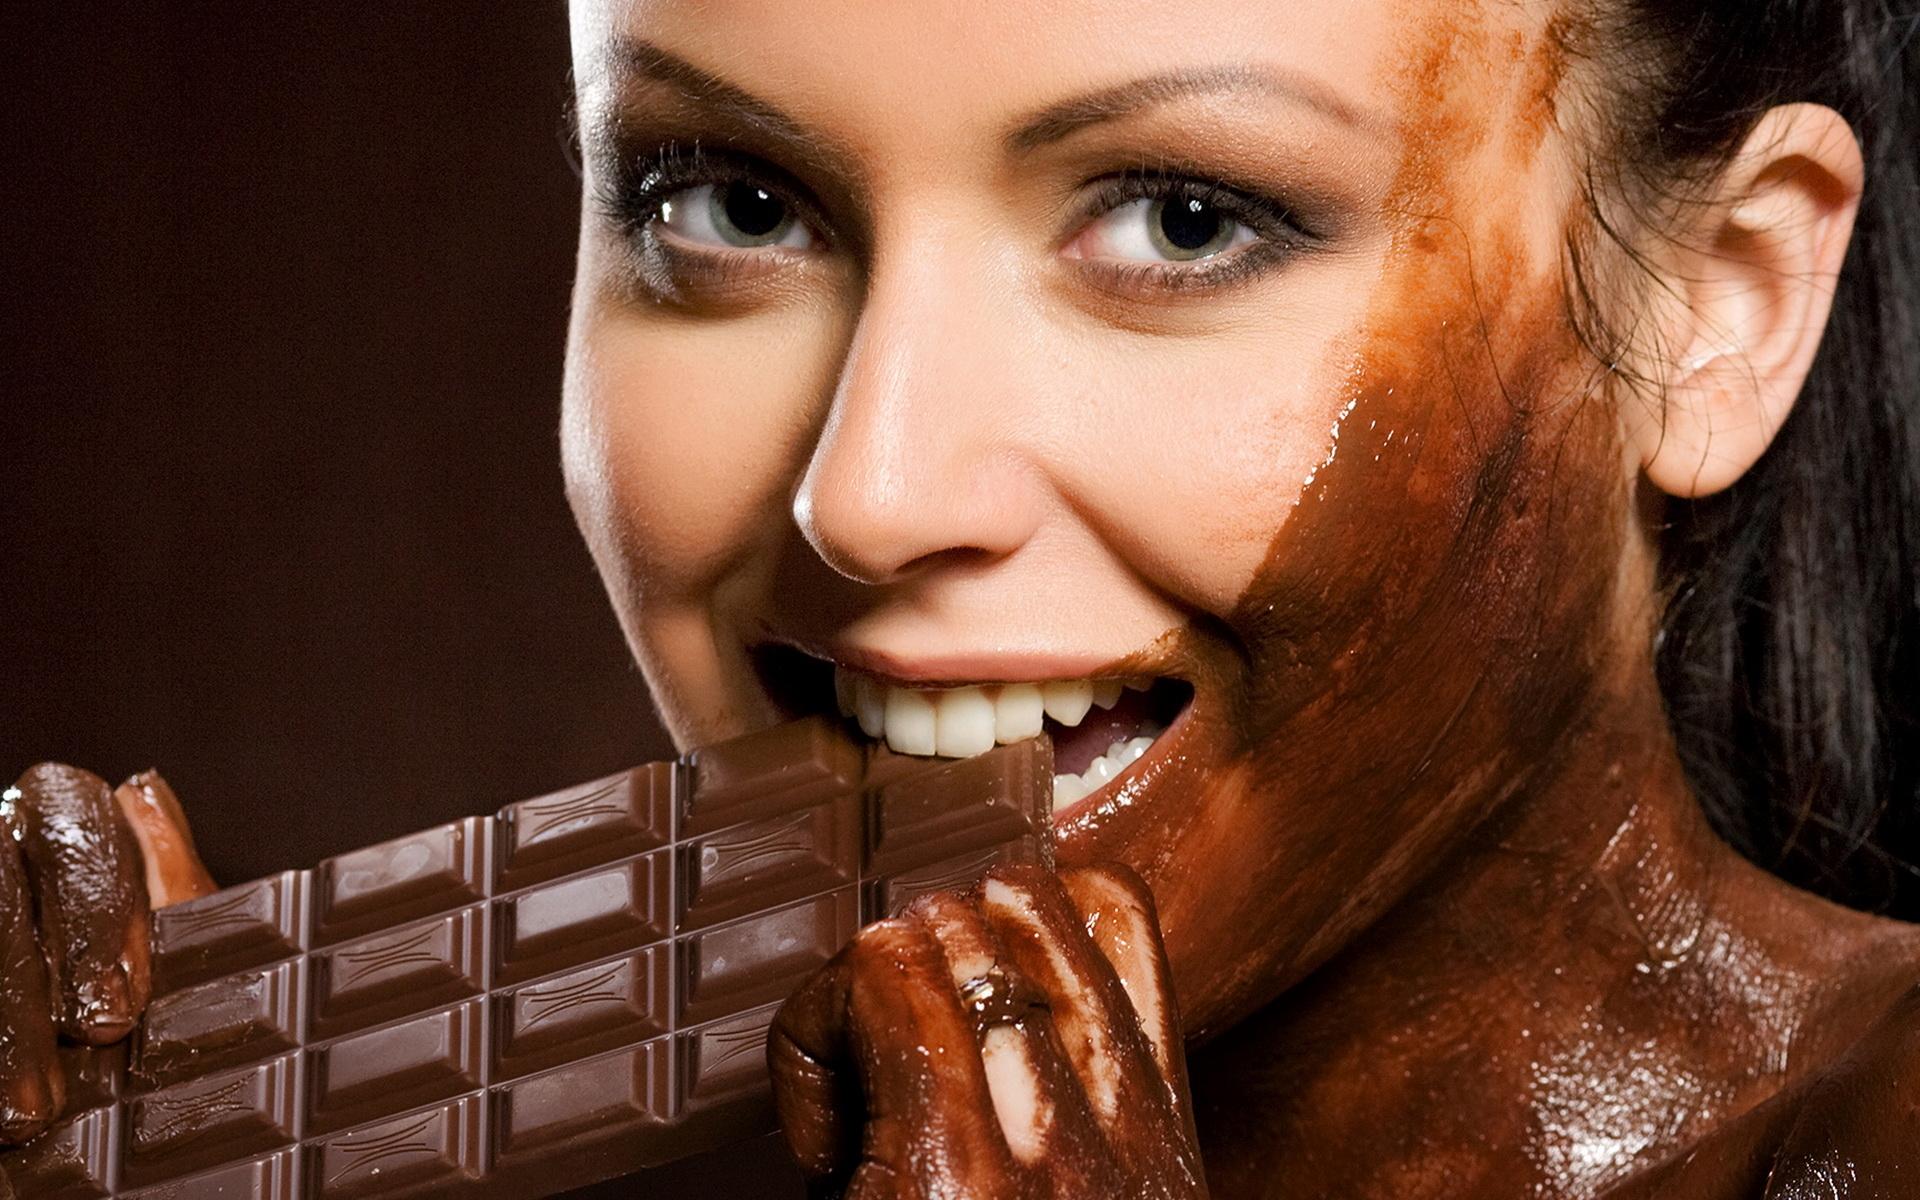 Girl_in_chocolate